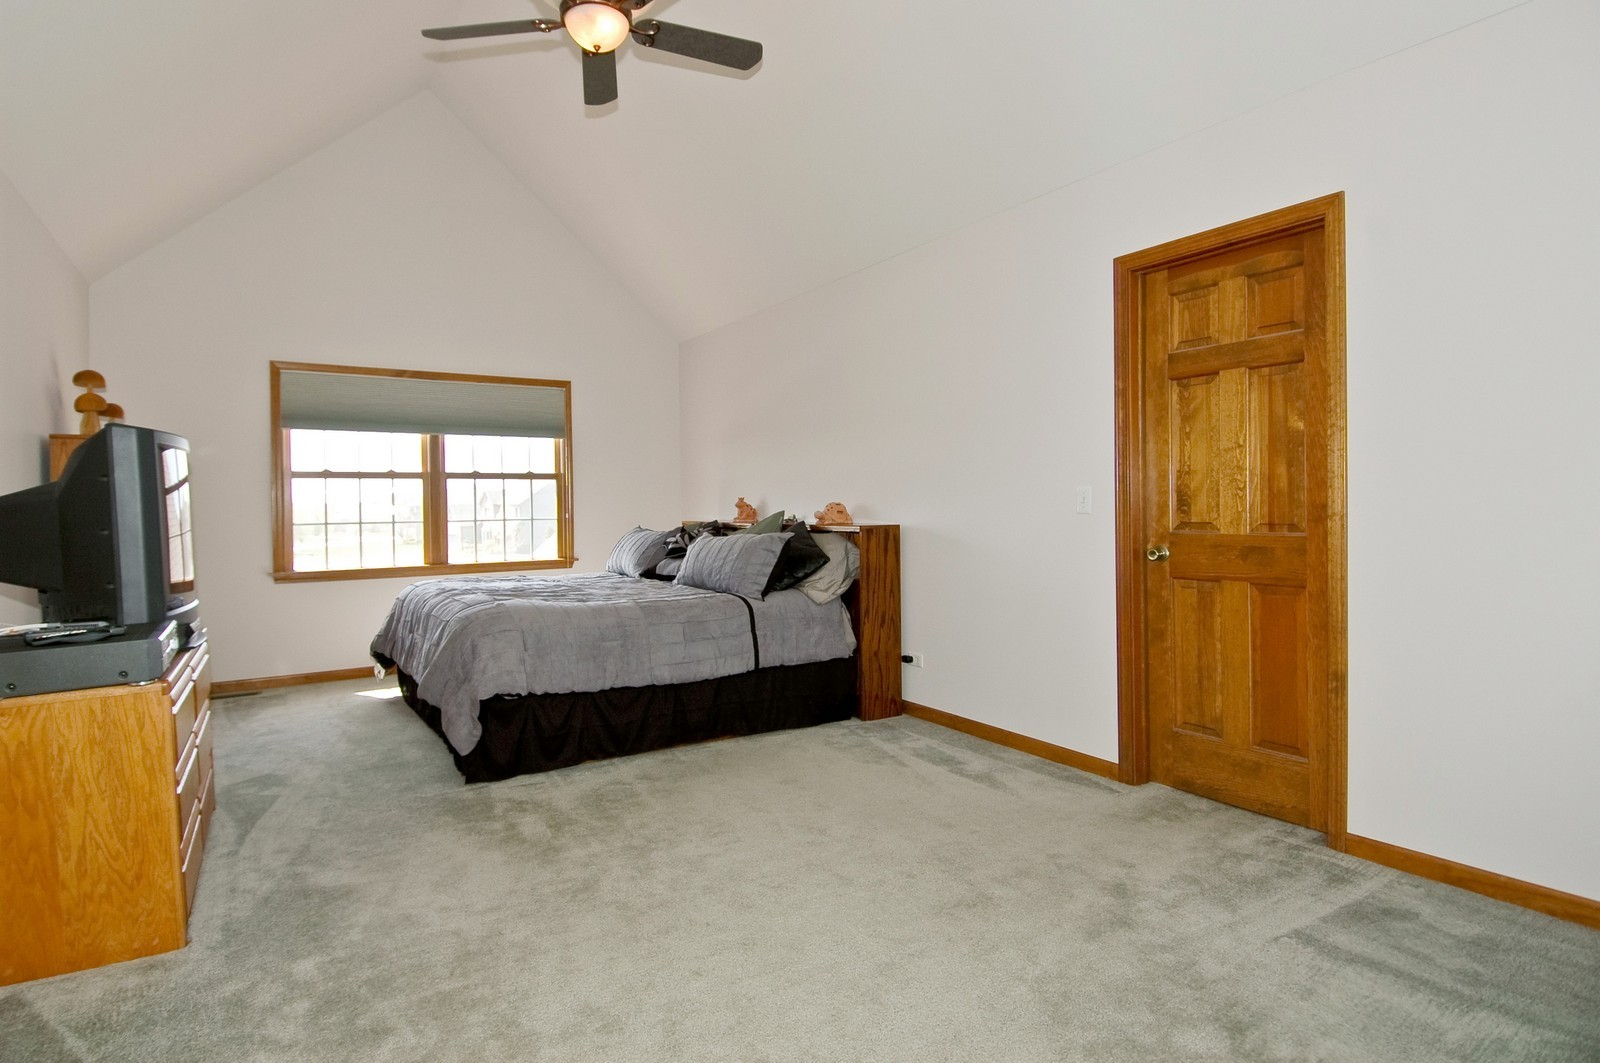 Real Estate Photography - 491 Clover, Algonquin, IL, 60102 - Master Bedroom